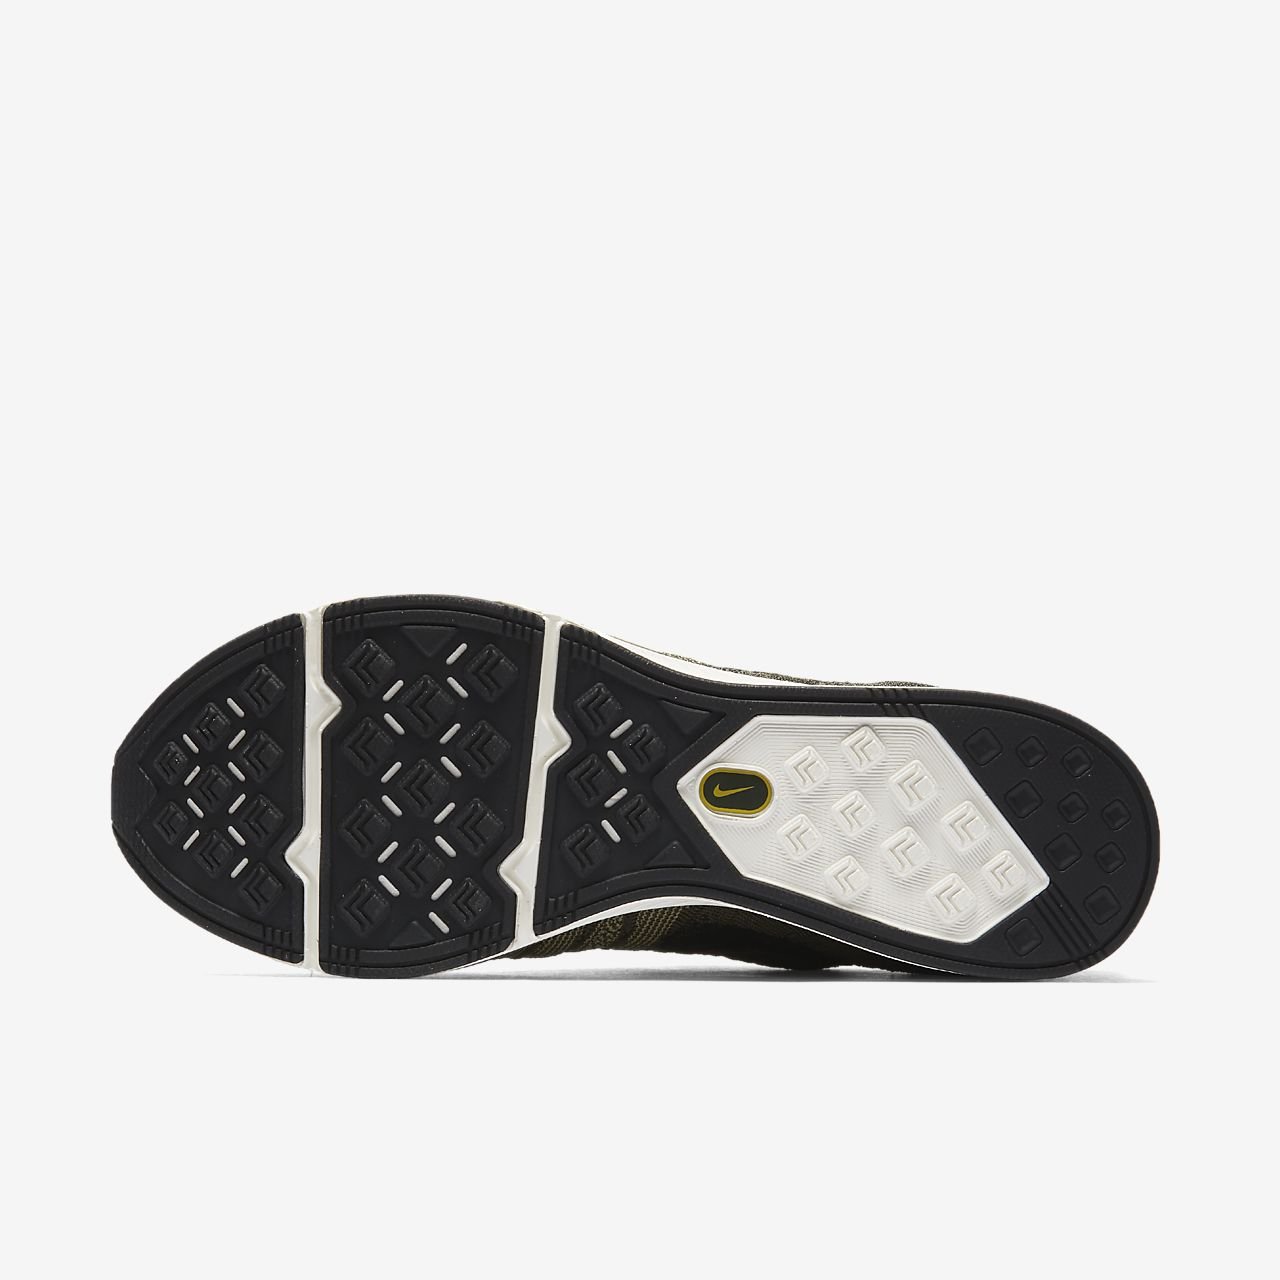 66f7f3e00c20 Nike Flyknit Trainer Unisex Shoe. Nike.com CA